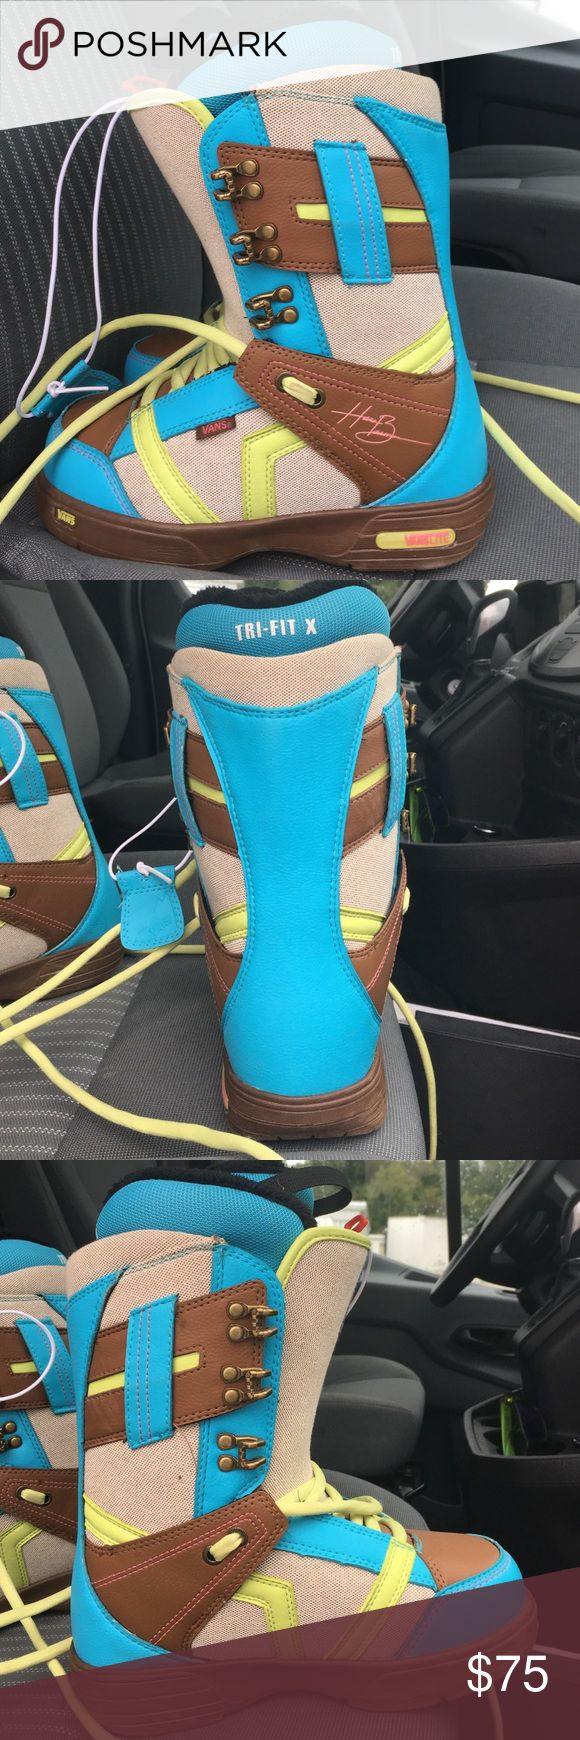 Vans Hi Standard Snowboard boots Brand new never worn women's snowboard boots. Very cute and comfortable! Vans Shoes